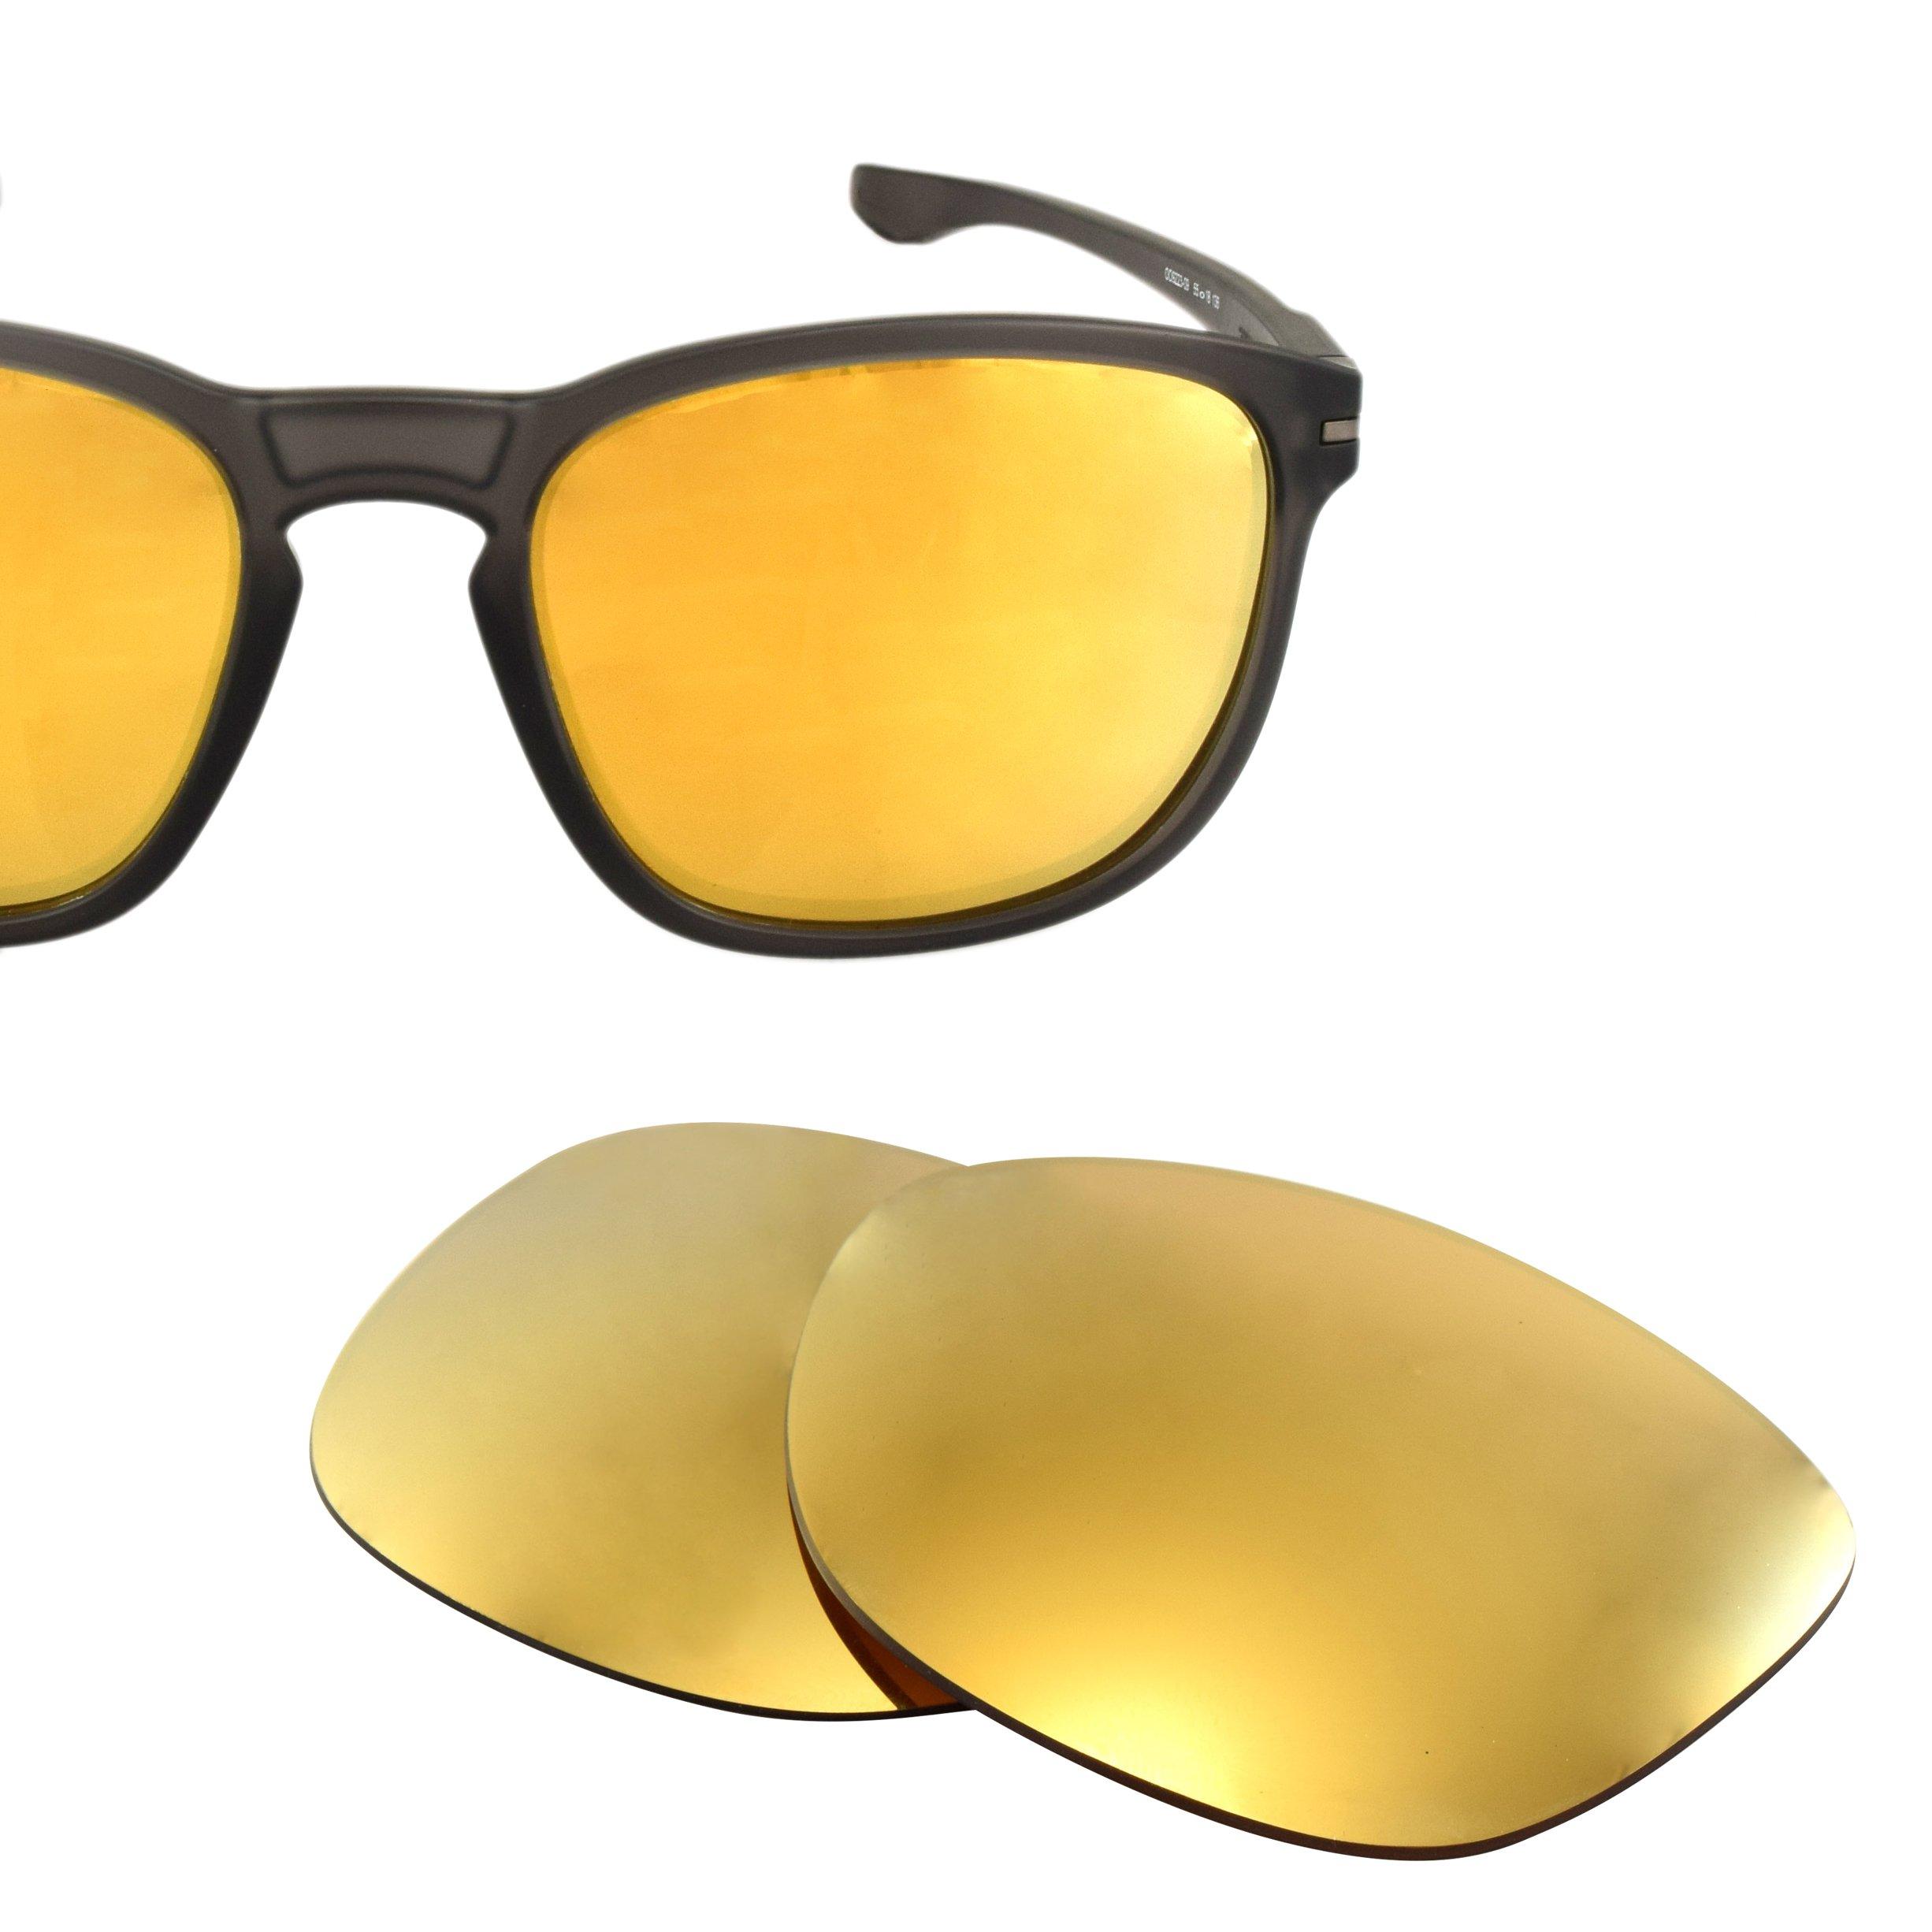 LenzFlip Replacement Lenses for Oakley ENDURO - Brown Polarized w/ 24K Gold Mirror